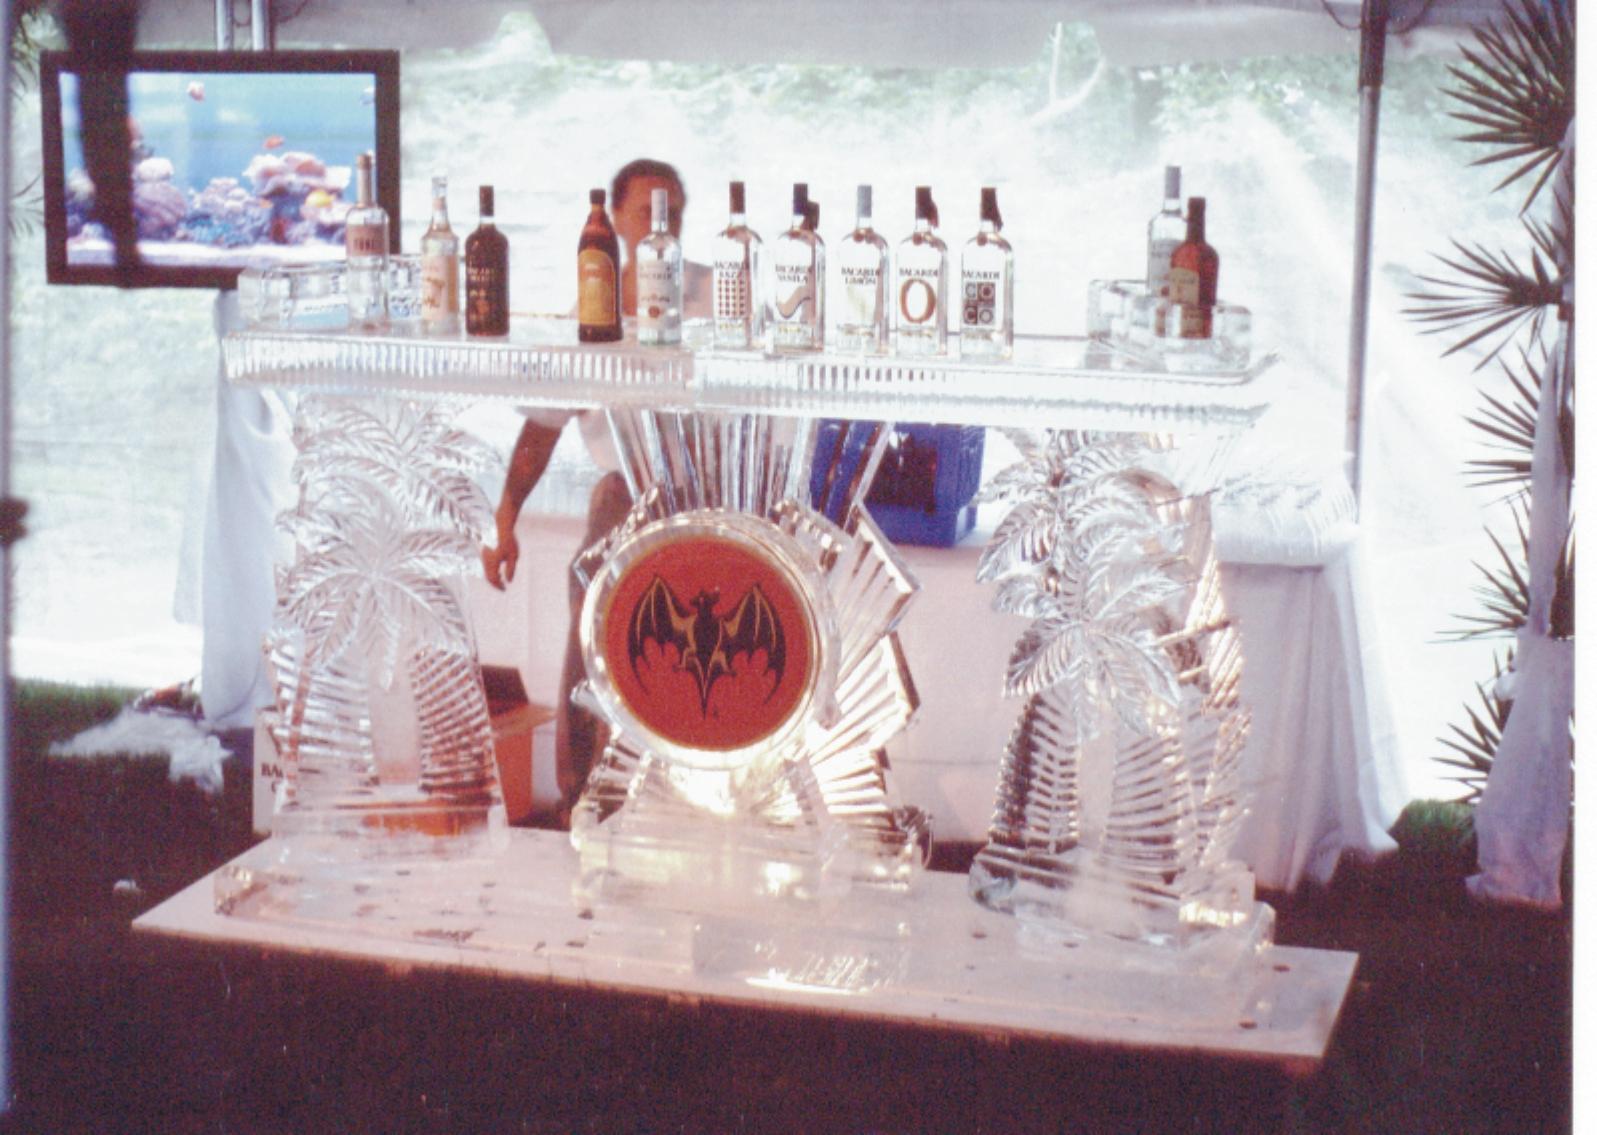 Barcardi Palm Tree Ice Bar